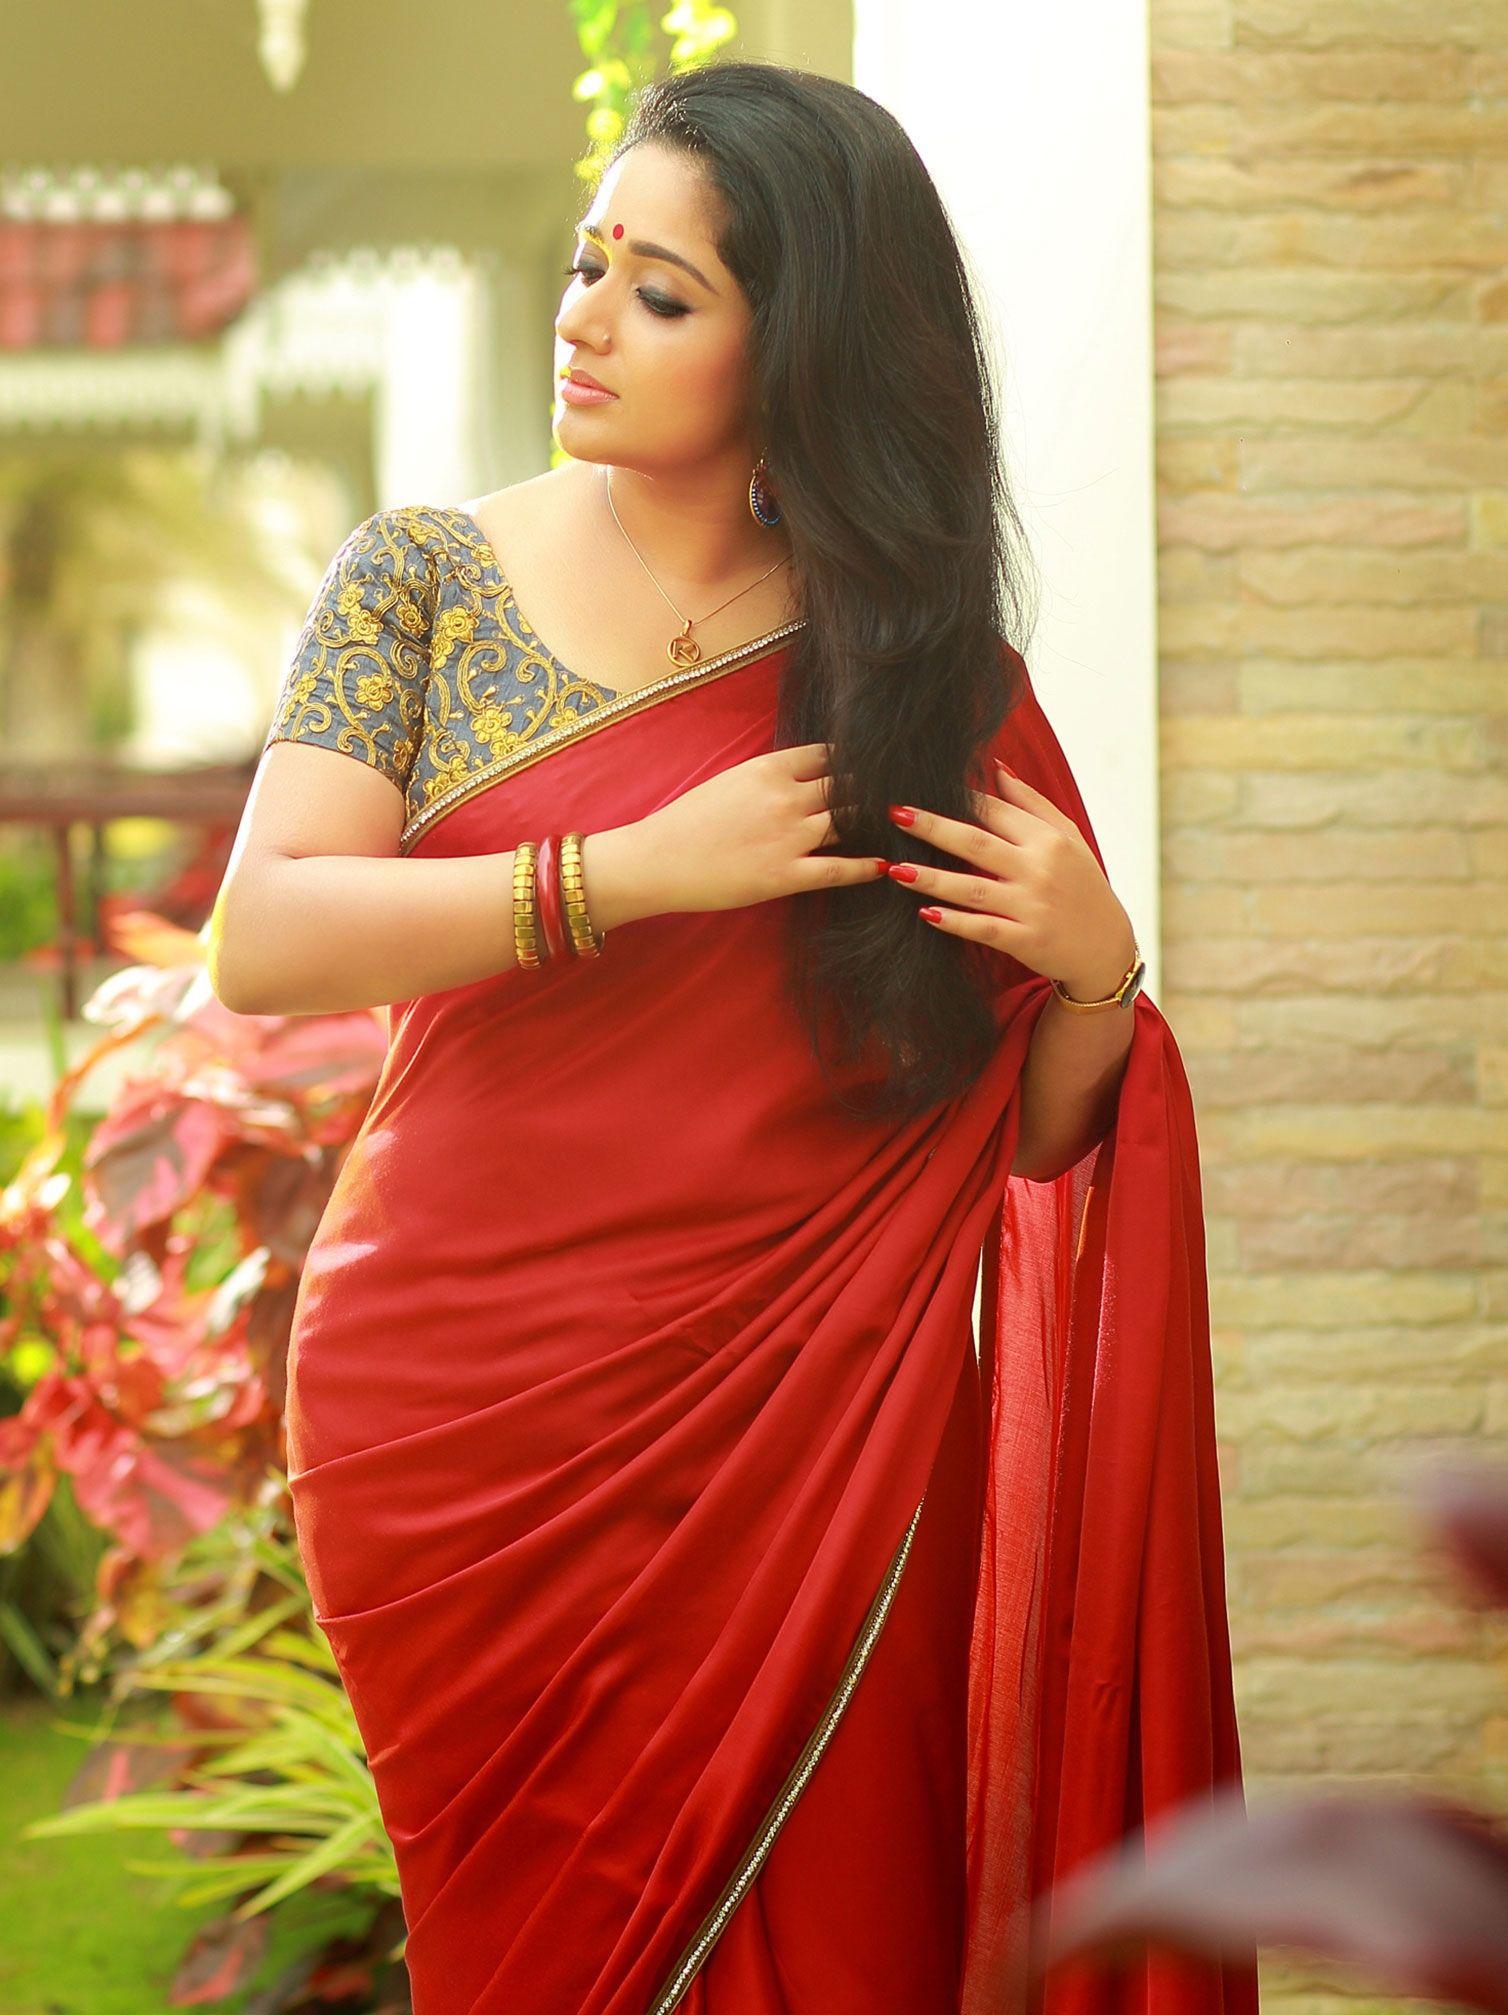 Jyothika traditional sari at shobi wedding saree blouse patterns - Jyothika Traditional Sari At Shobi Wedding Saree Blouse Patterns 24